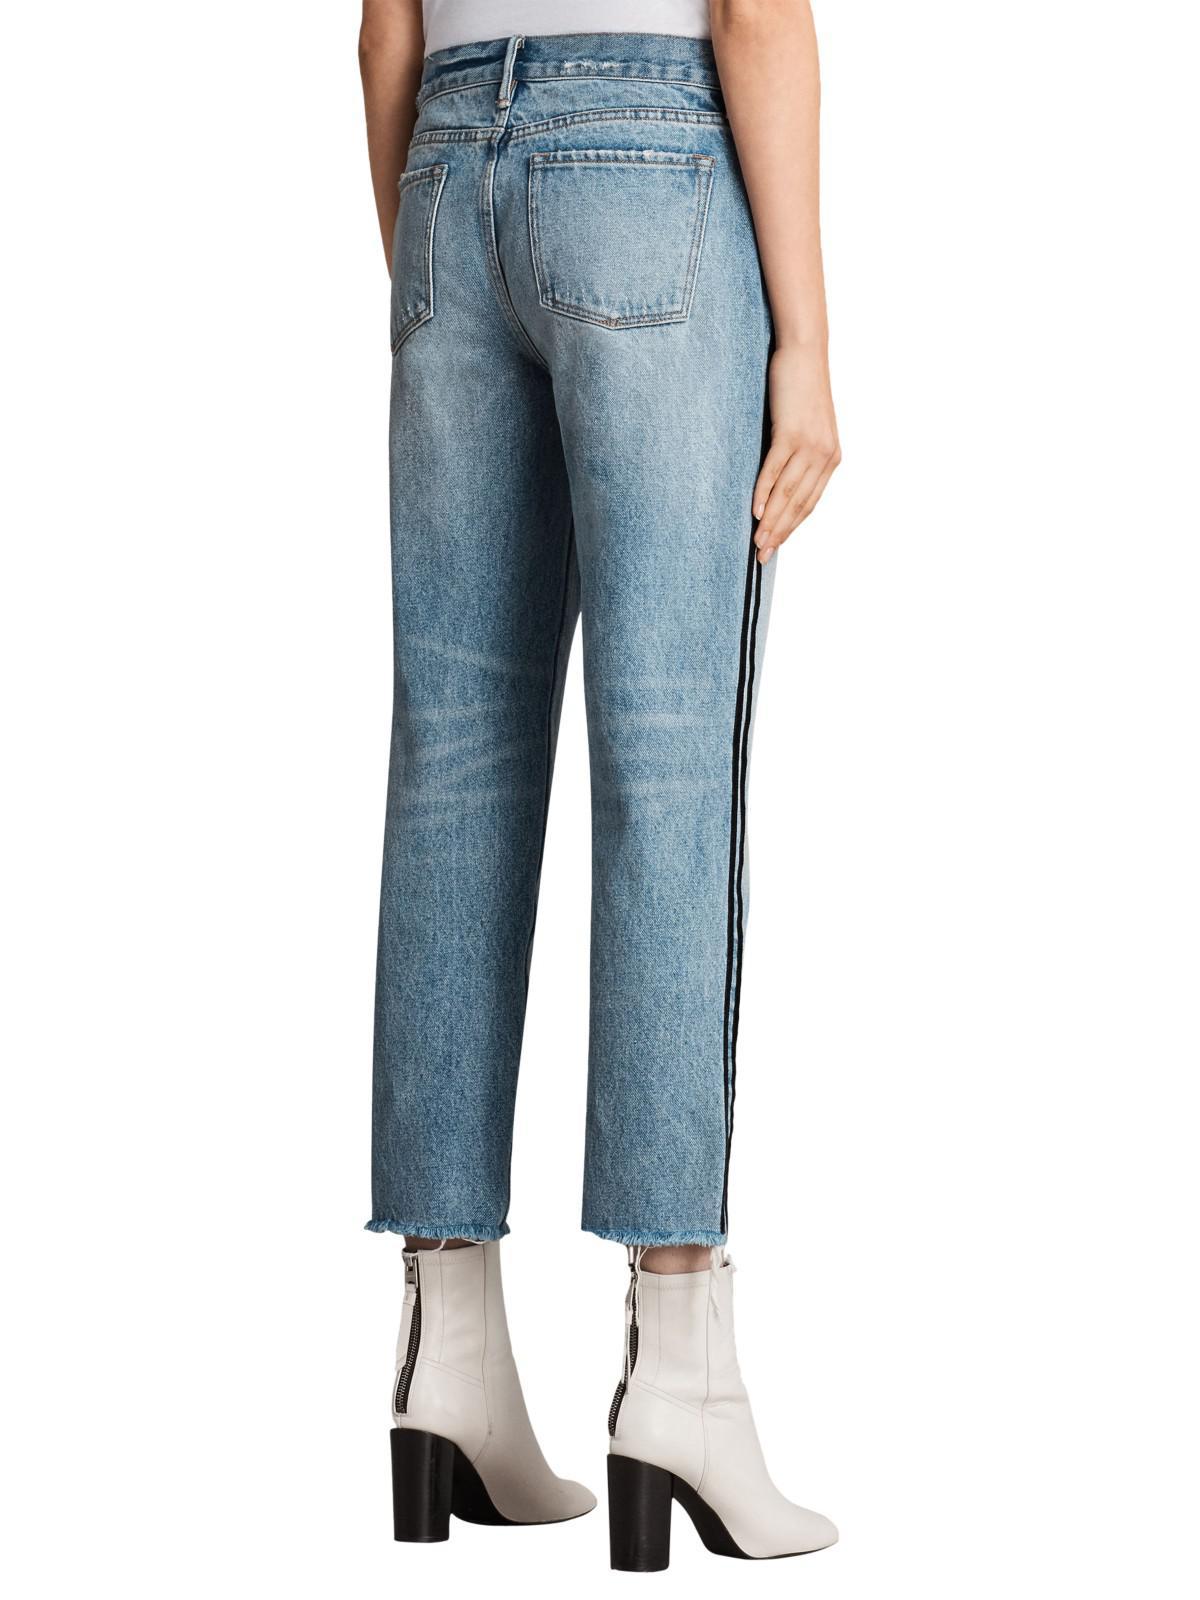 AllSaints Denim Boys Stripe Jeans in Light Indigo/Blue (Blue)